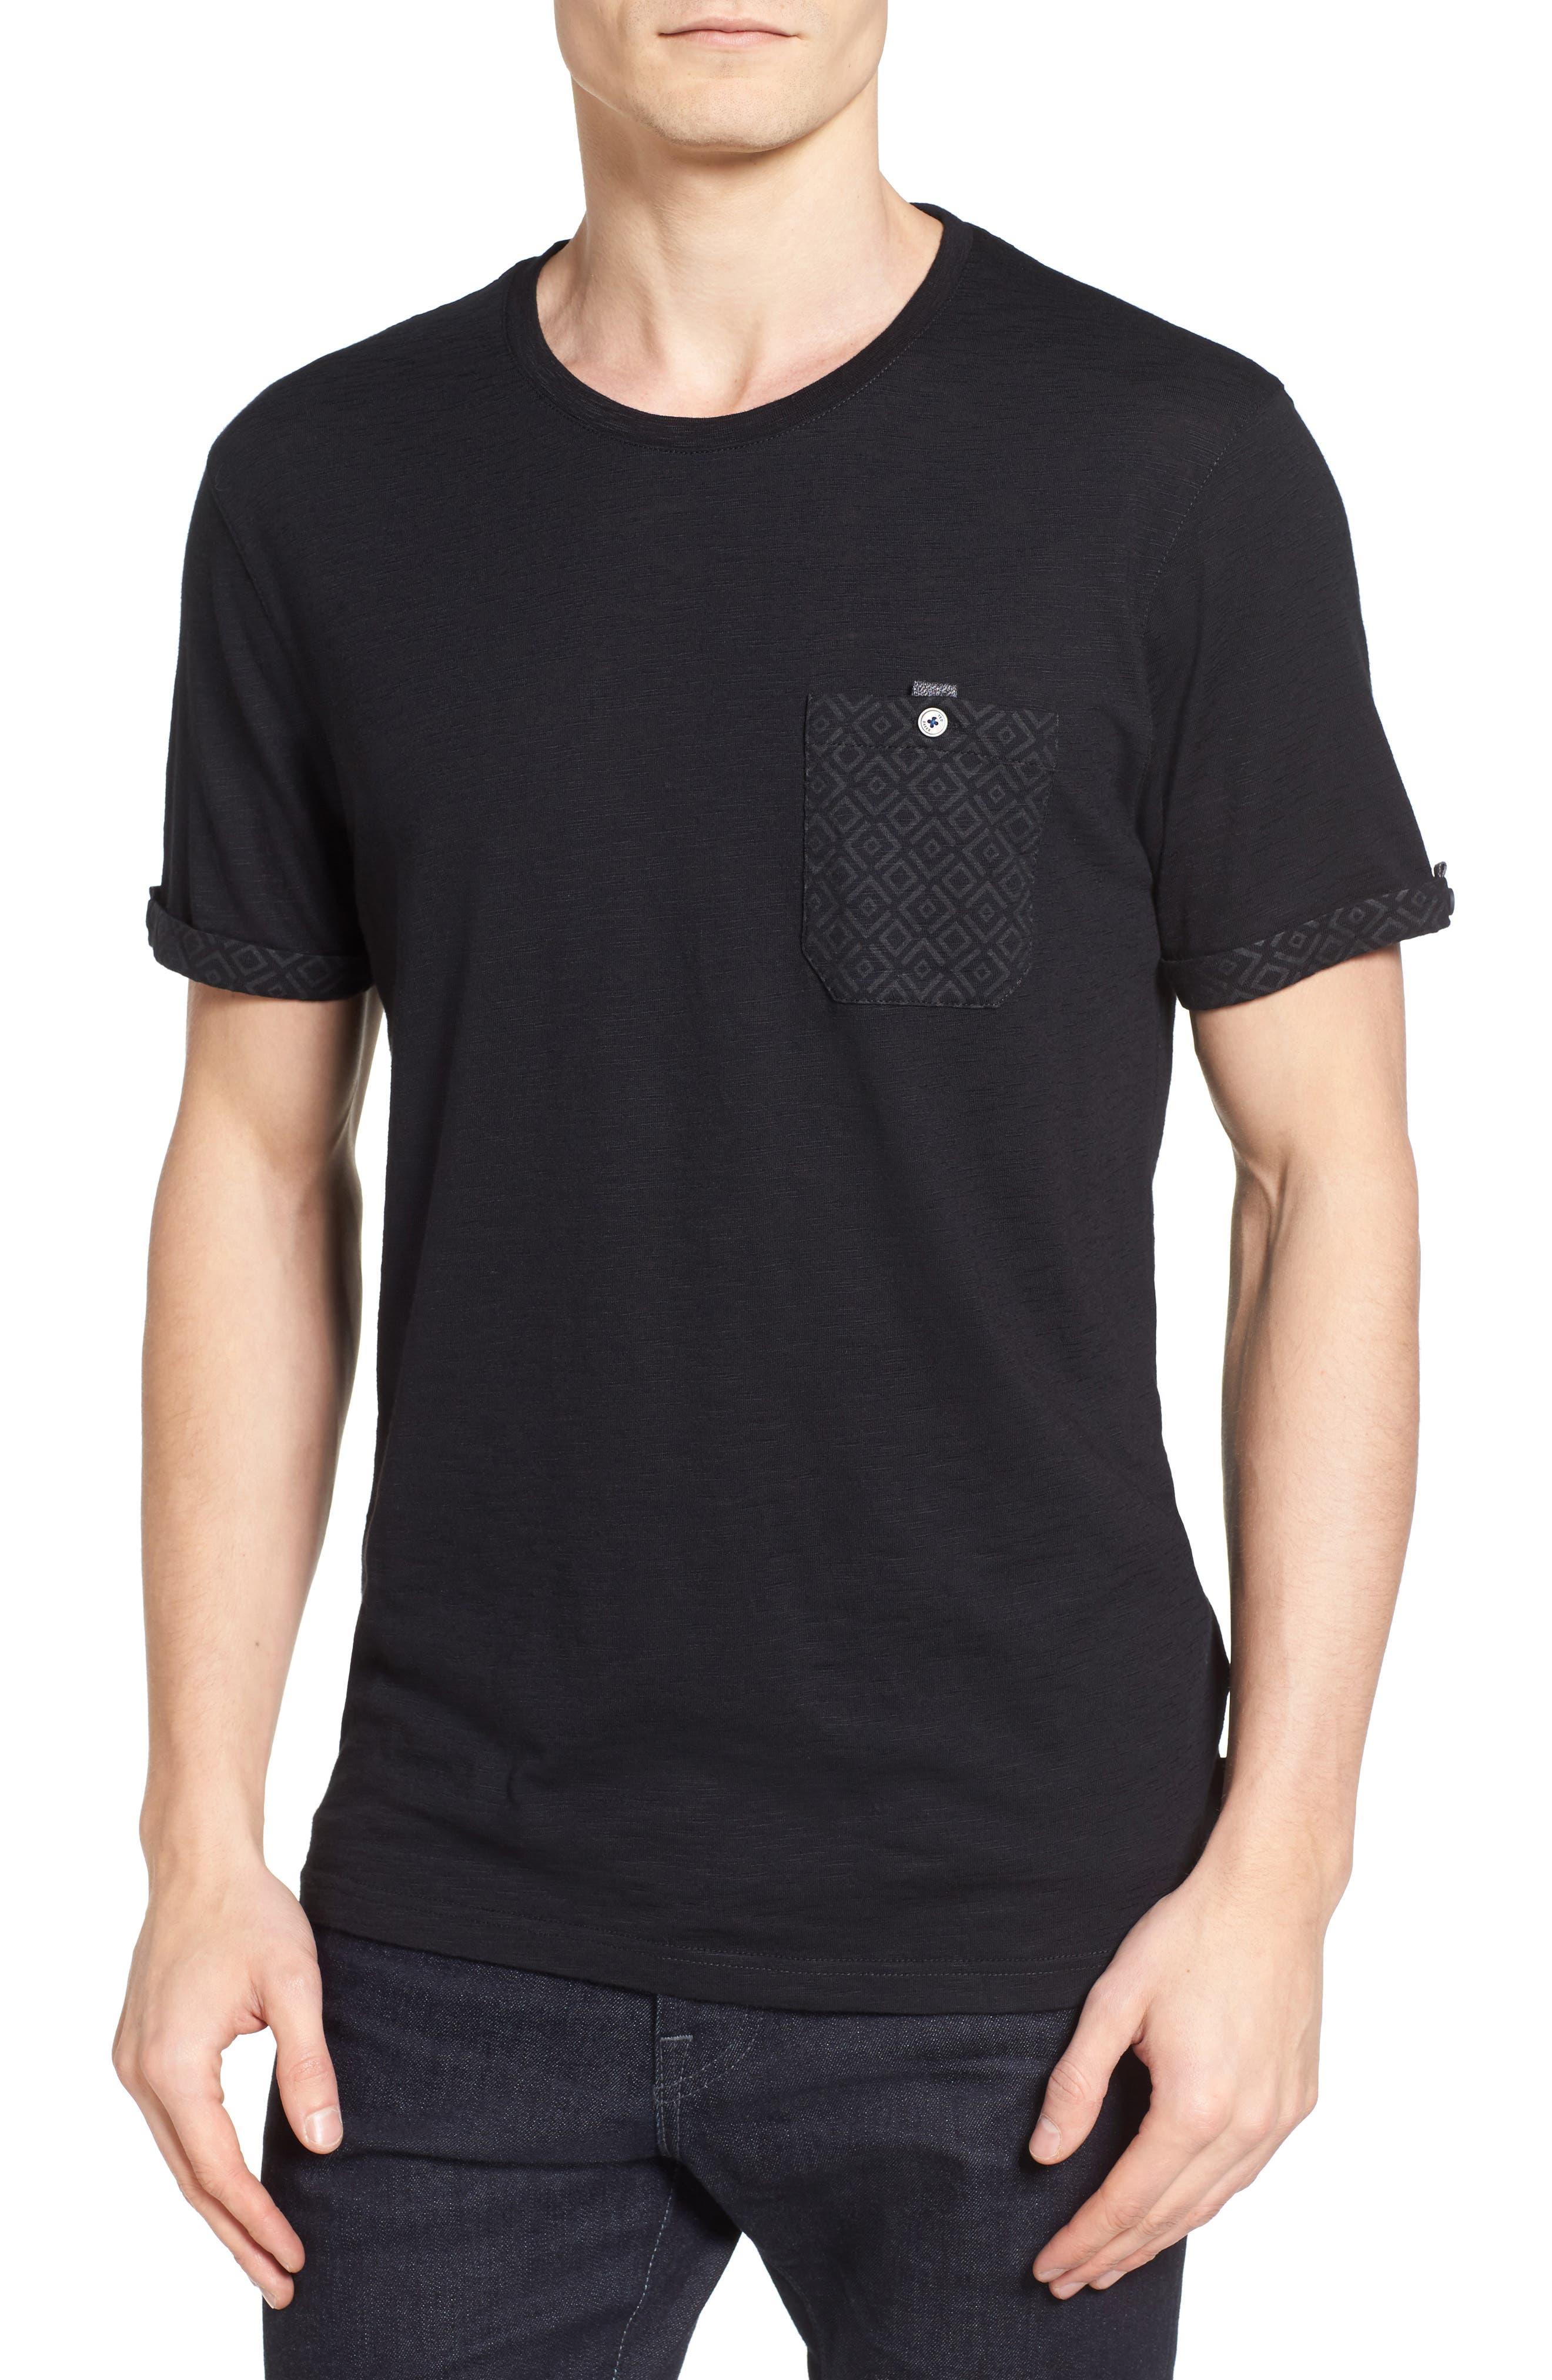 Apel Print Pocket T-Shirt,                             Main thumbnail 1, color,                             001